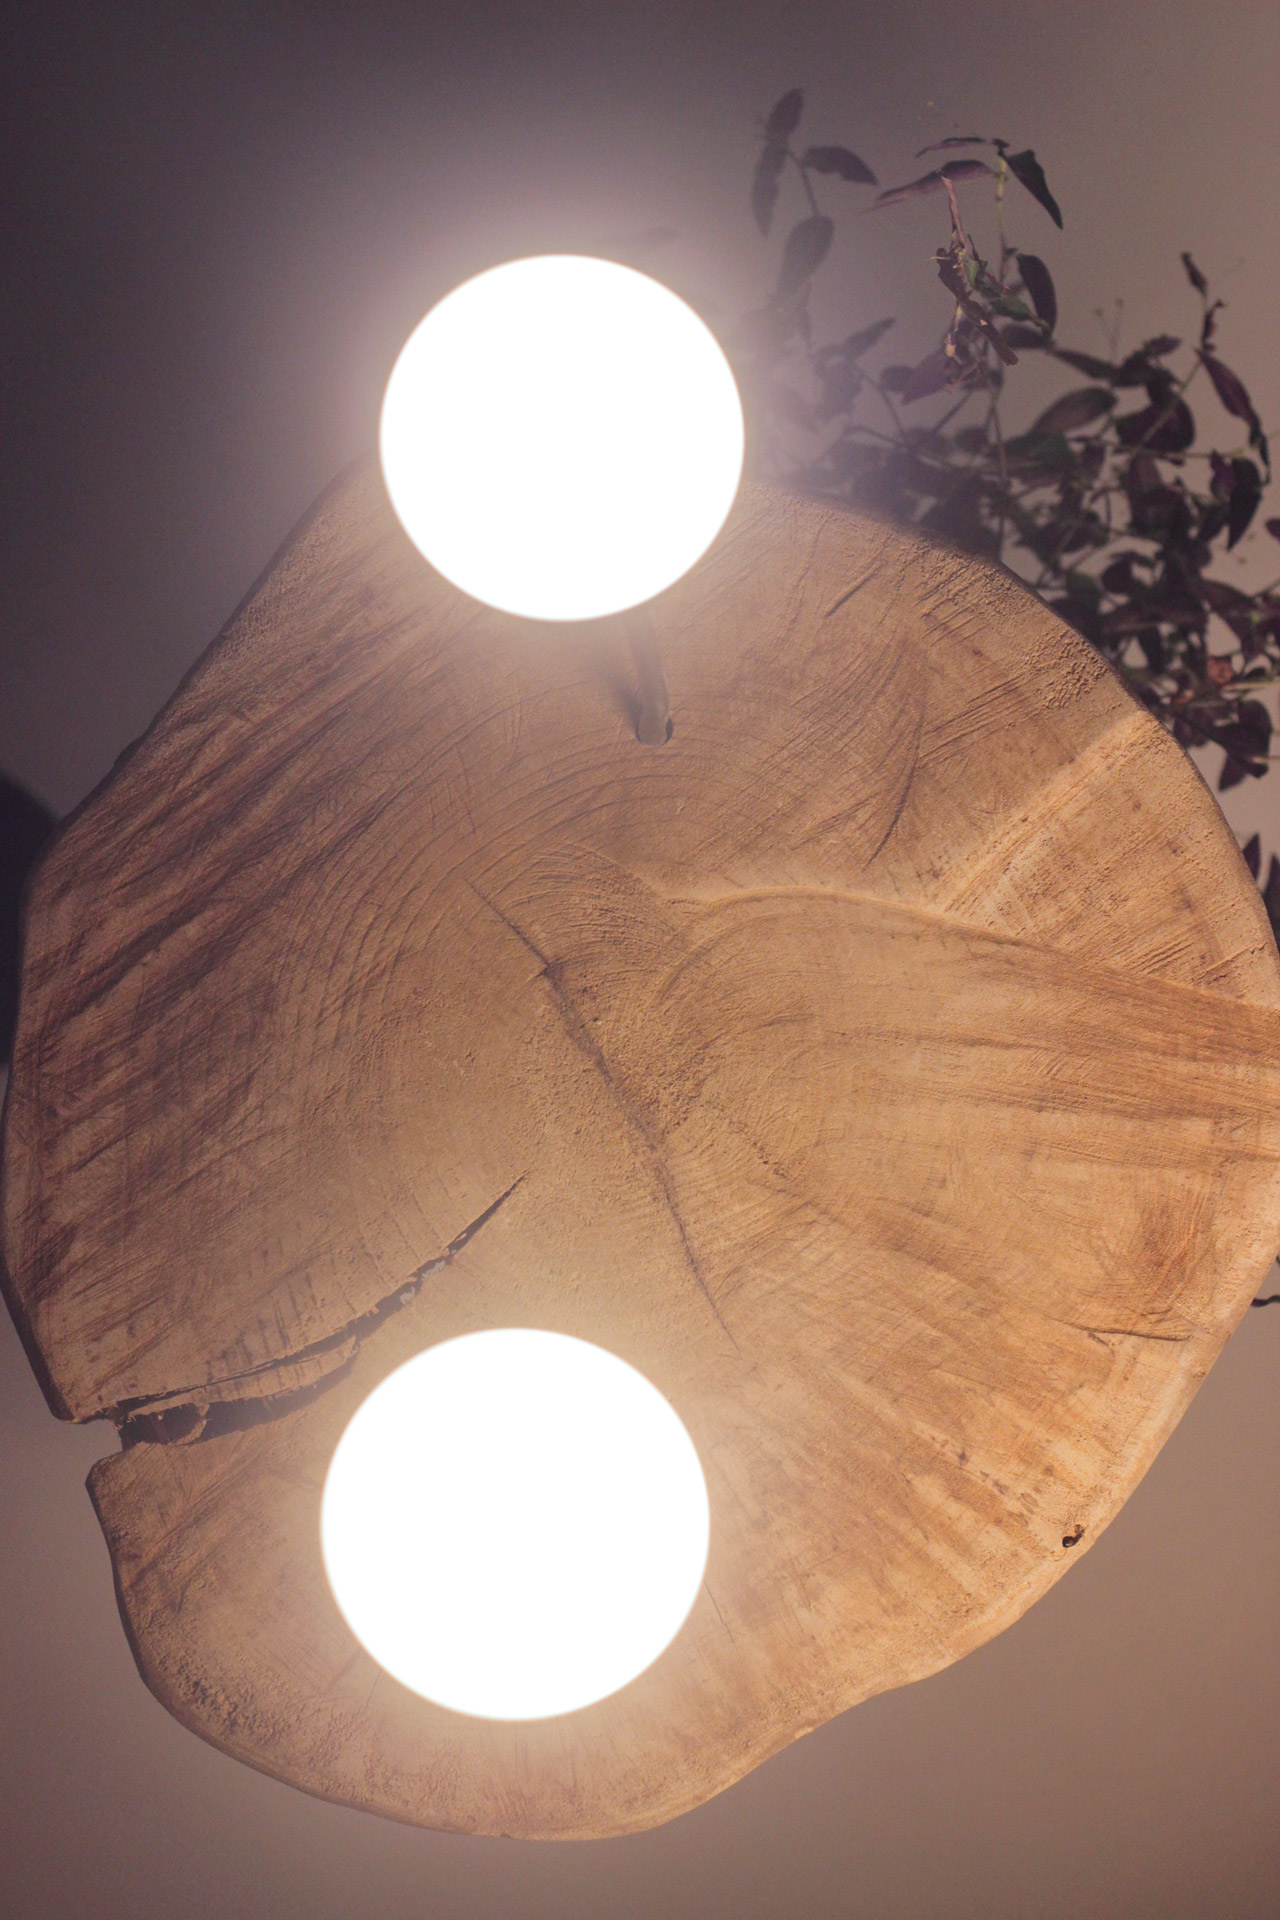 bolacha-de-tronco-luminaria-como-fazer